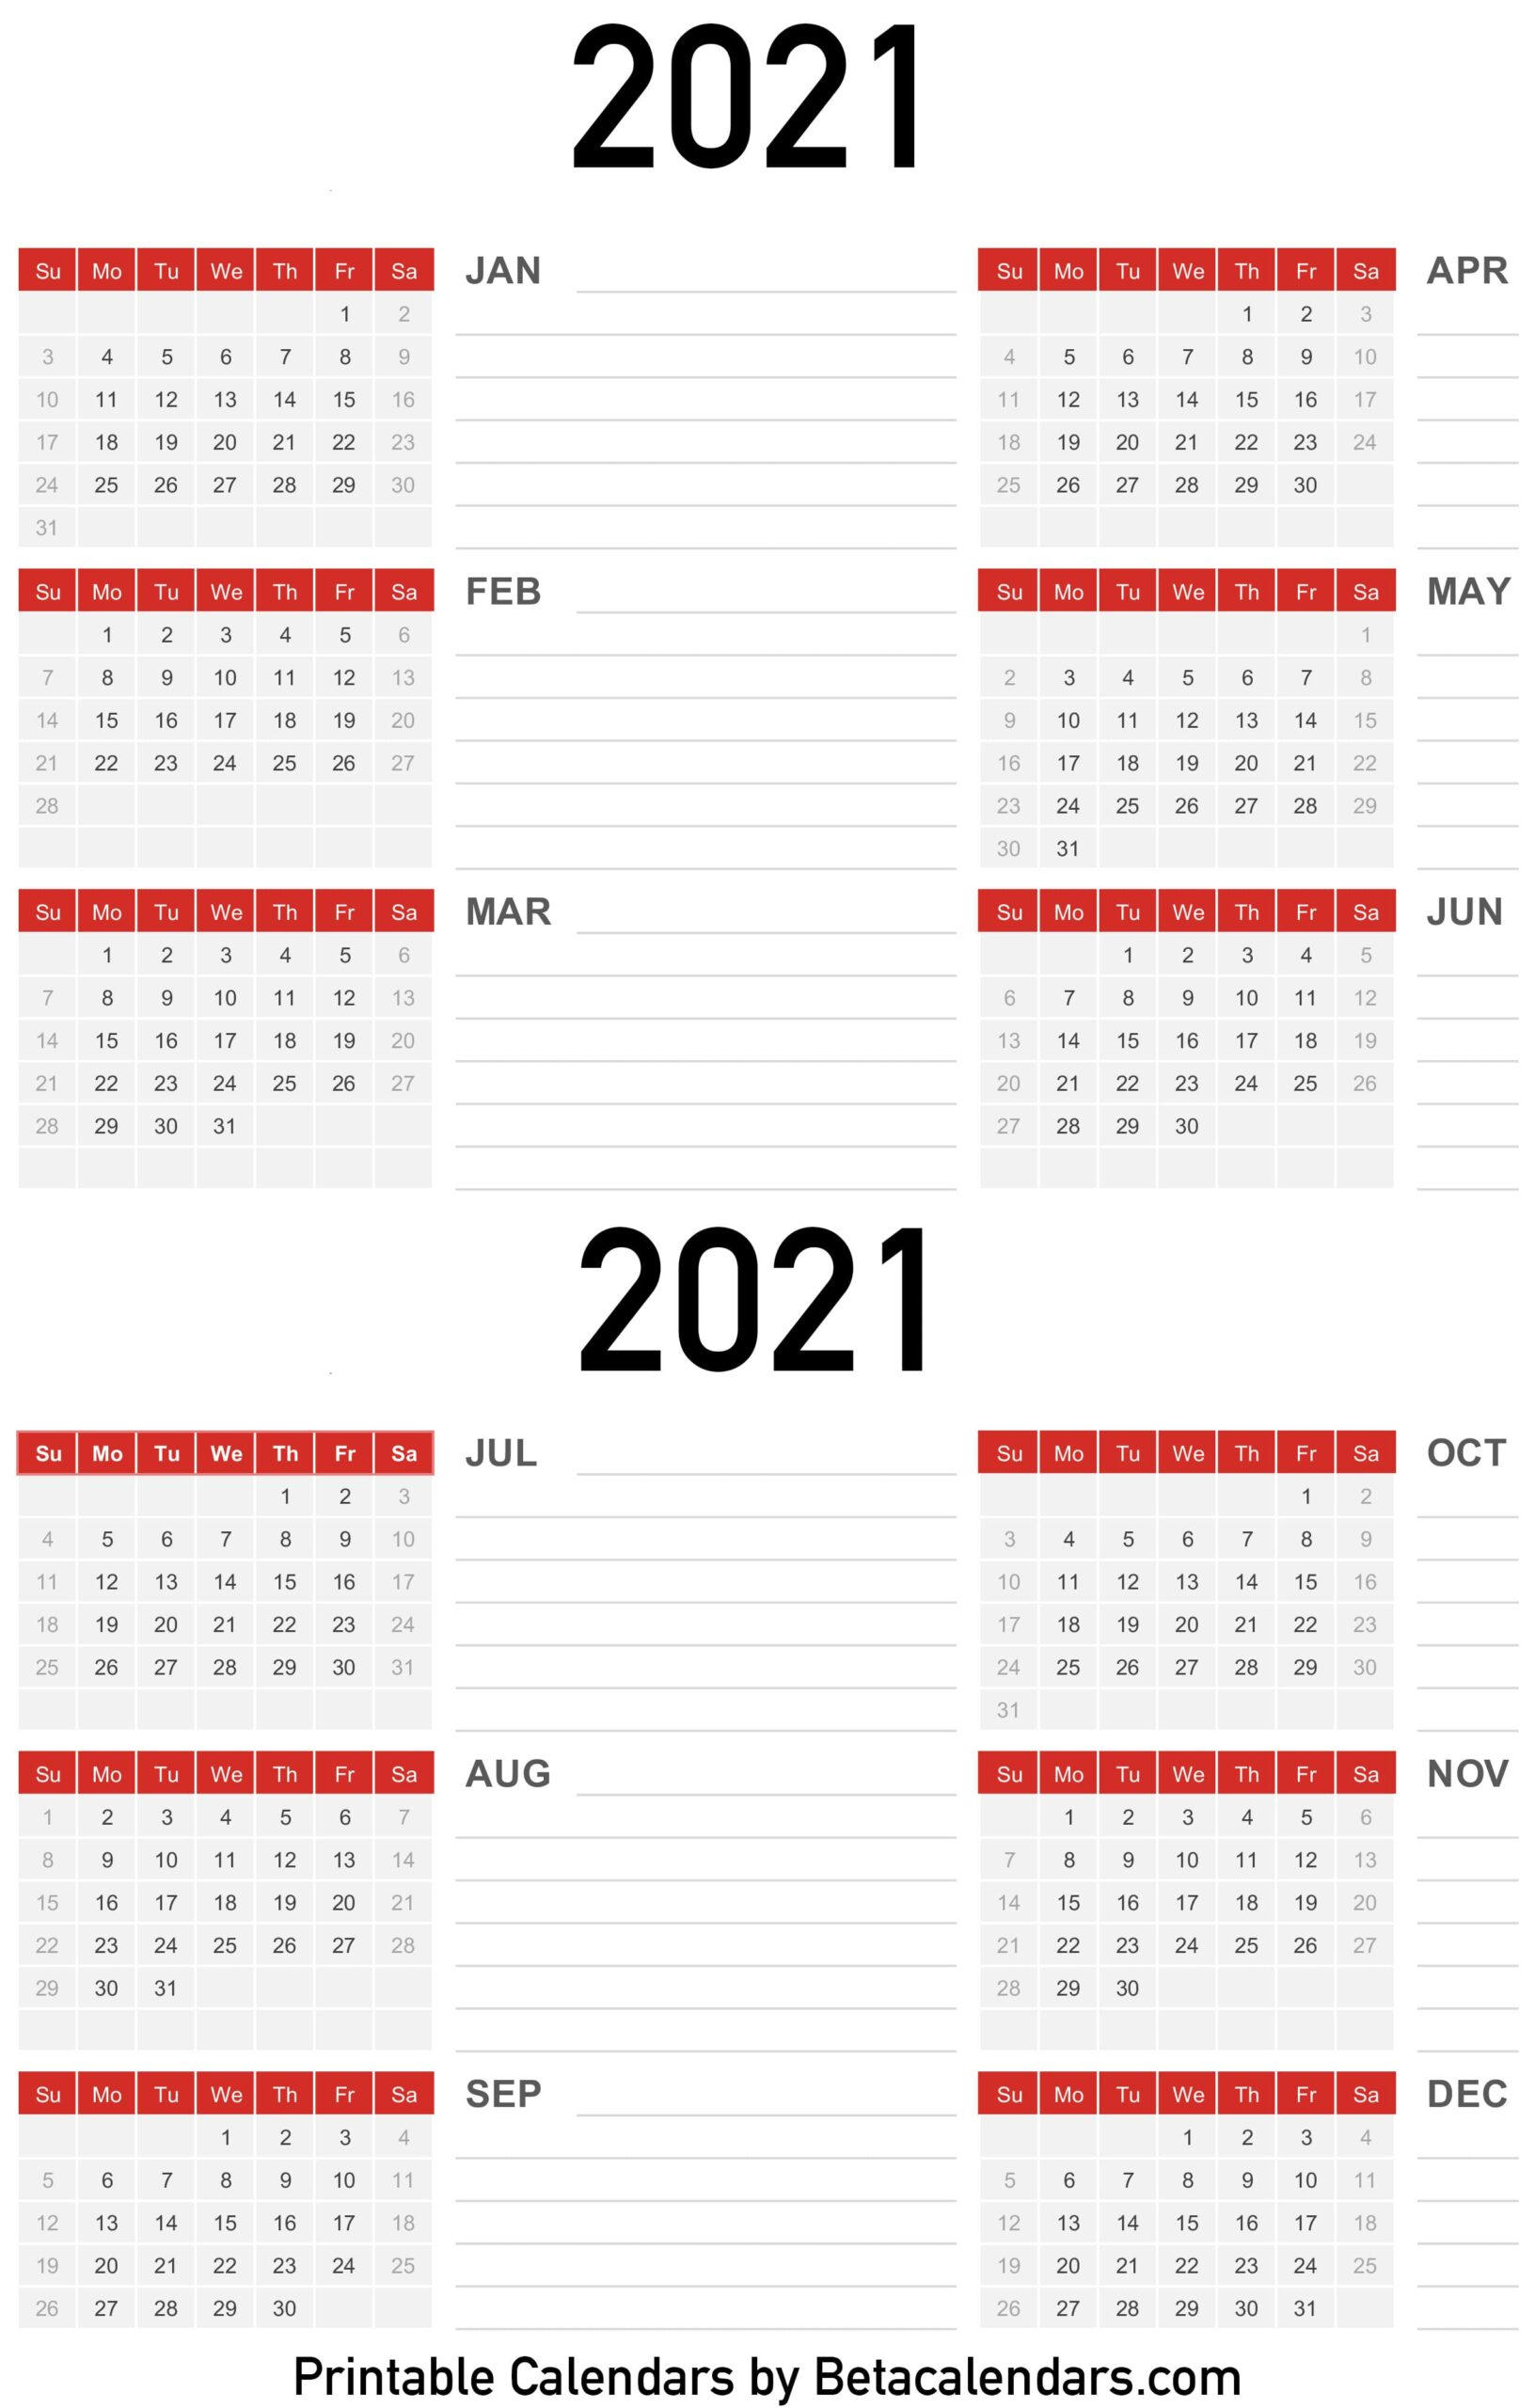 2021 Calendar Beta Calendars 1